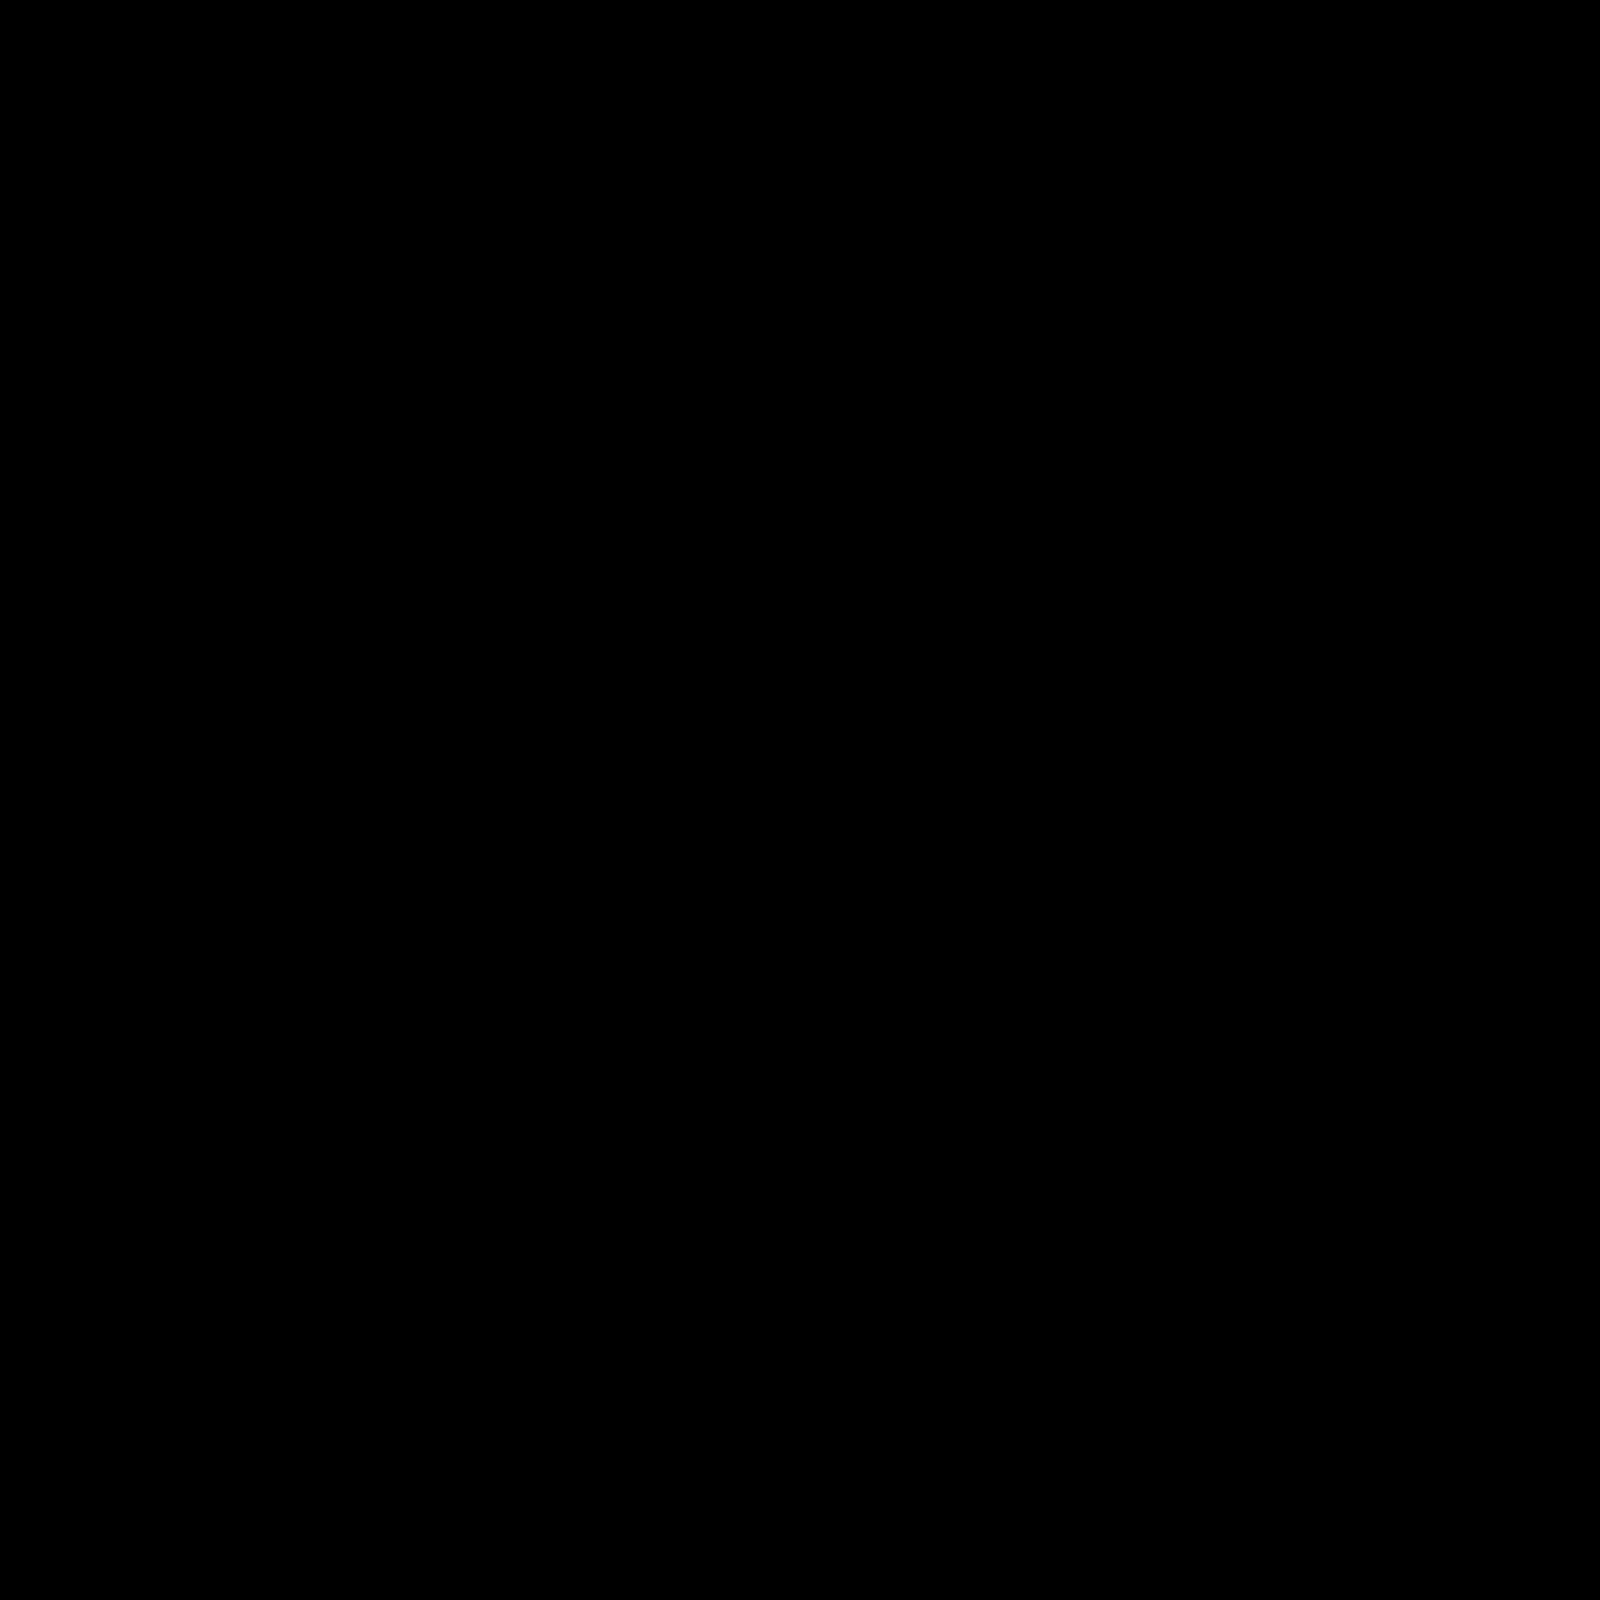 clip art library download Vector color triangle.  acro clip for